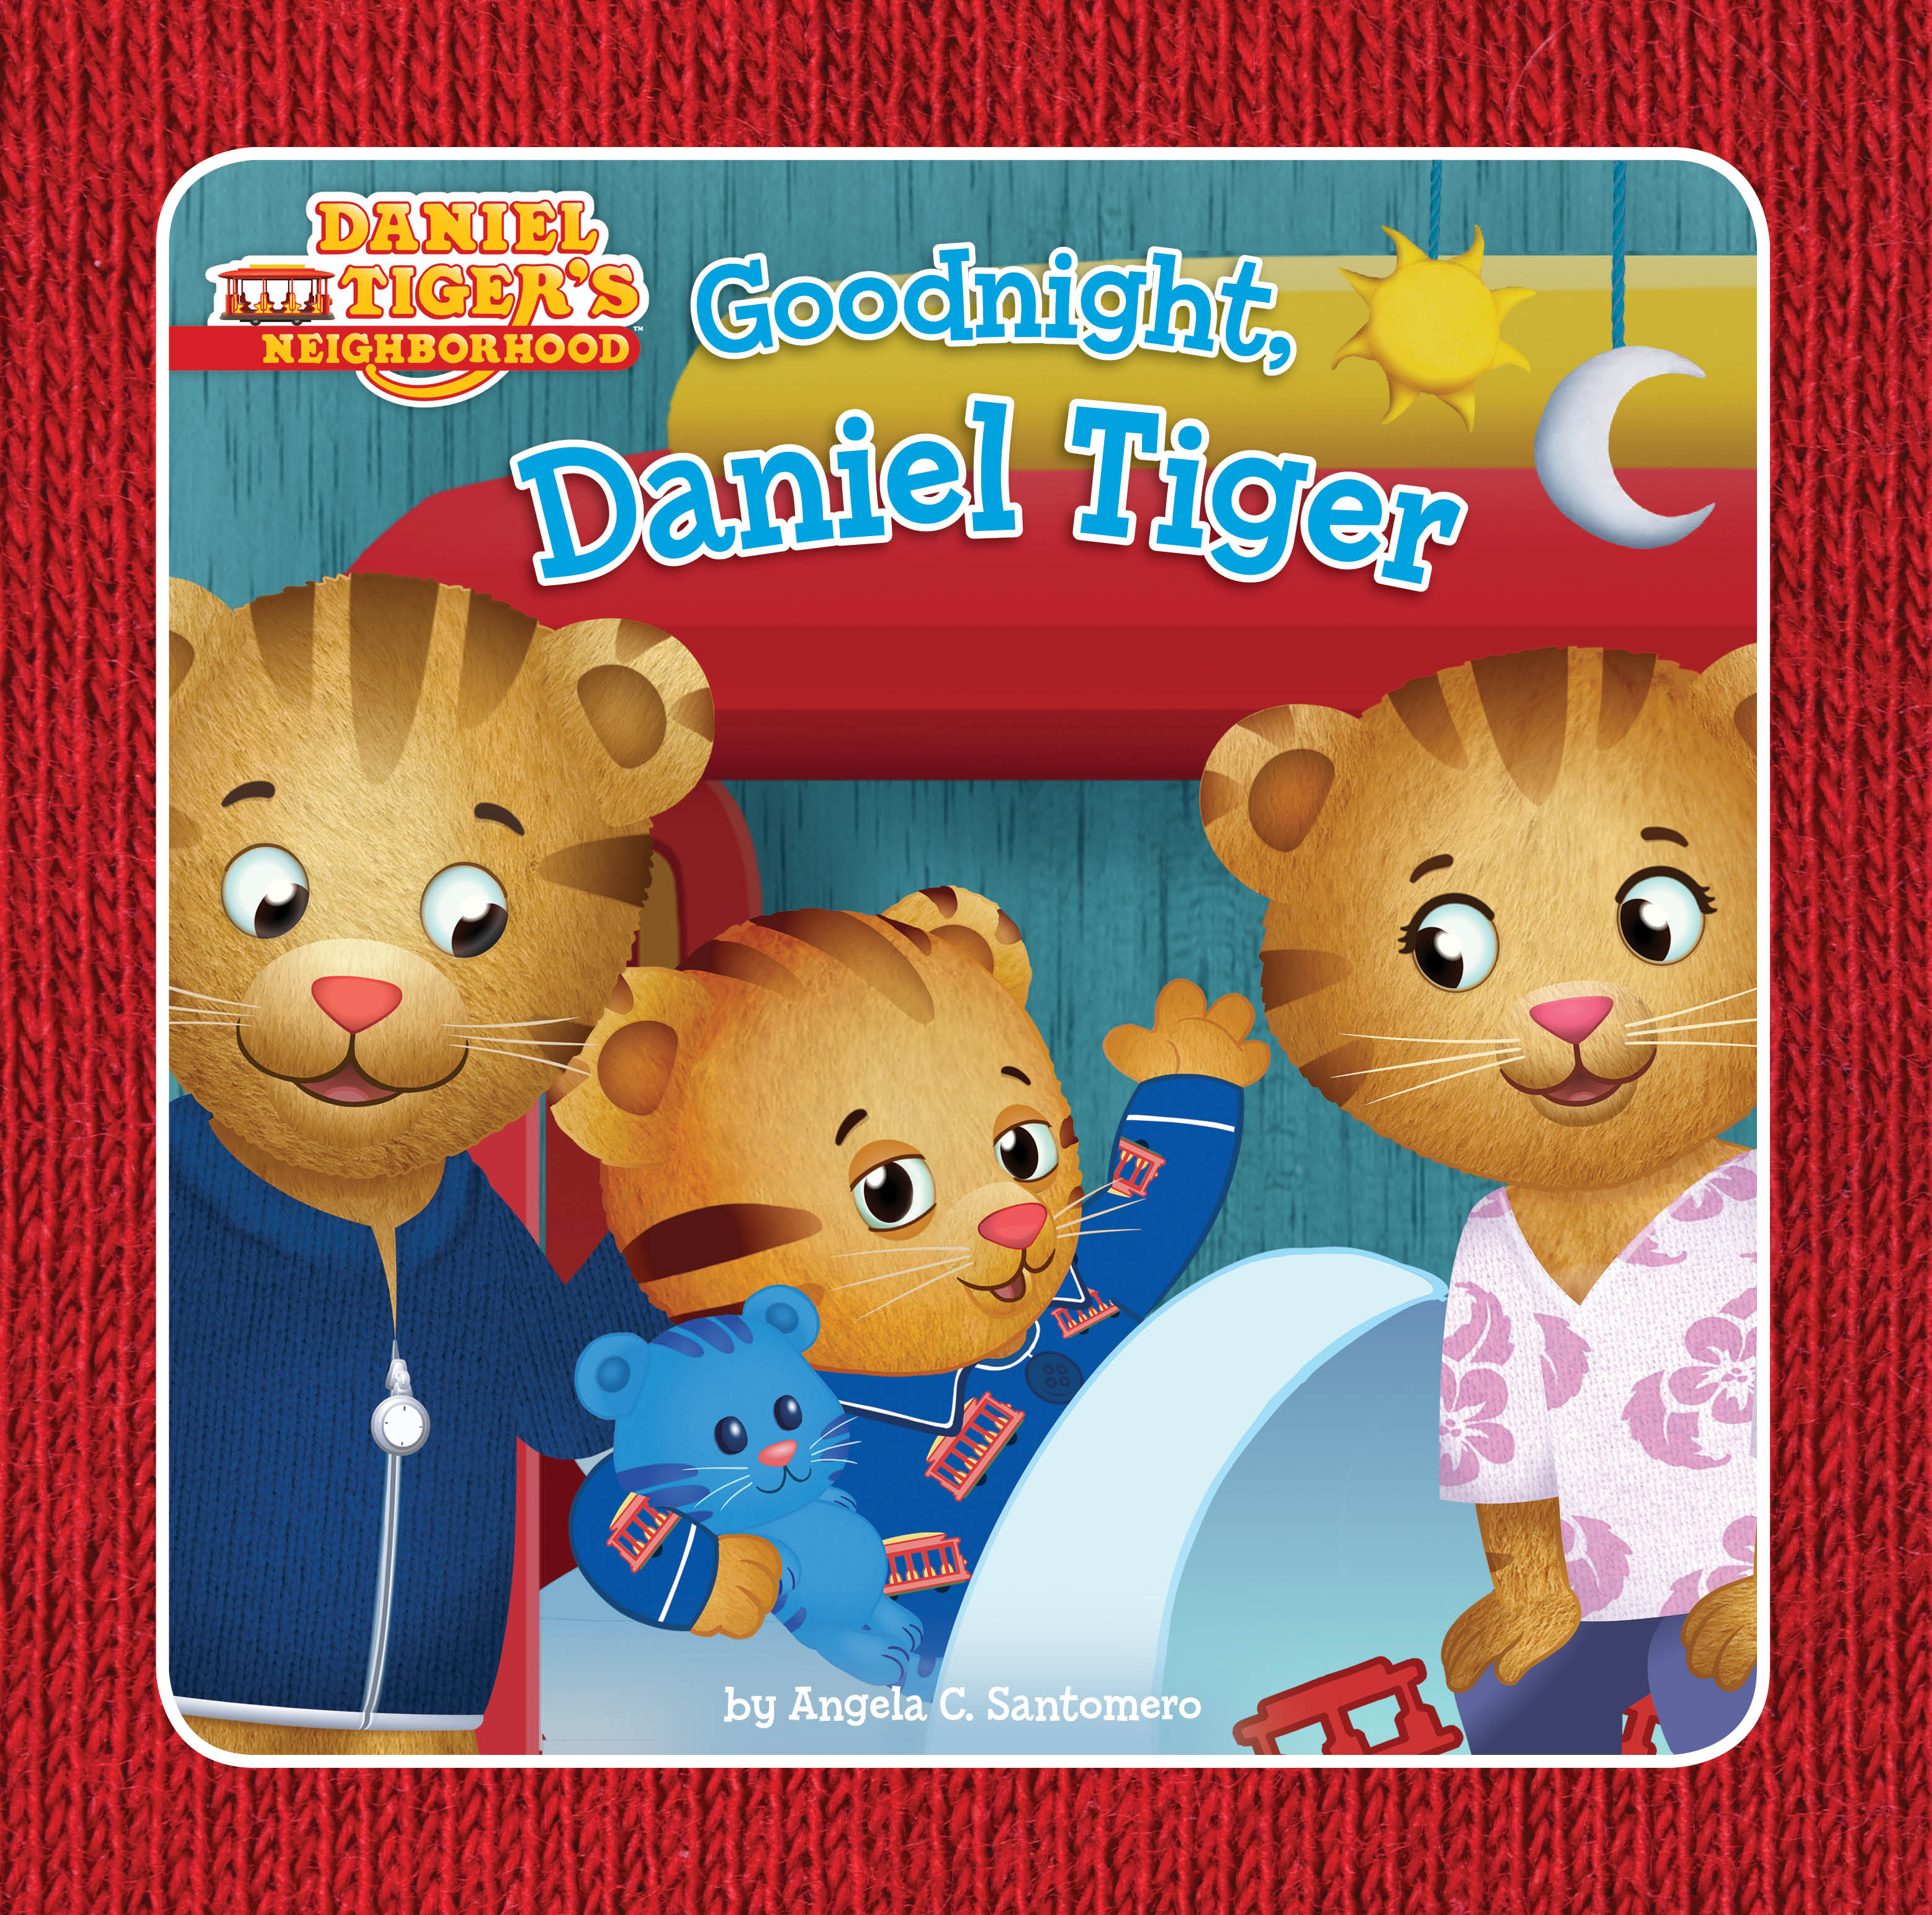 Goodnight daniel tiger 9781481400480 hr